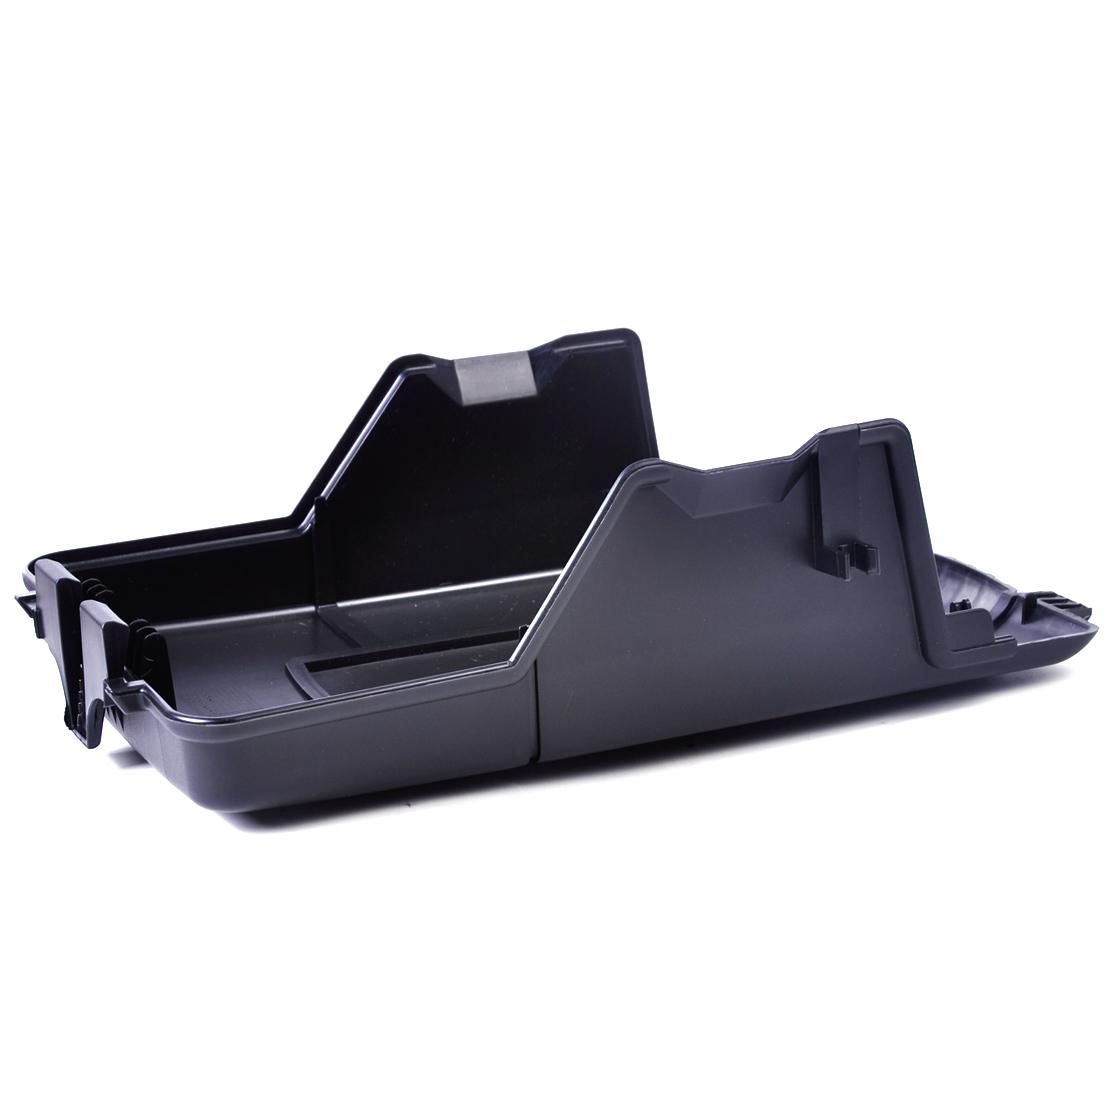 1KD 915 443 Battery Tray Cover Trim For VW Jetta Golf Touran Tiguan   eBay